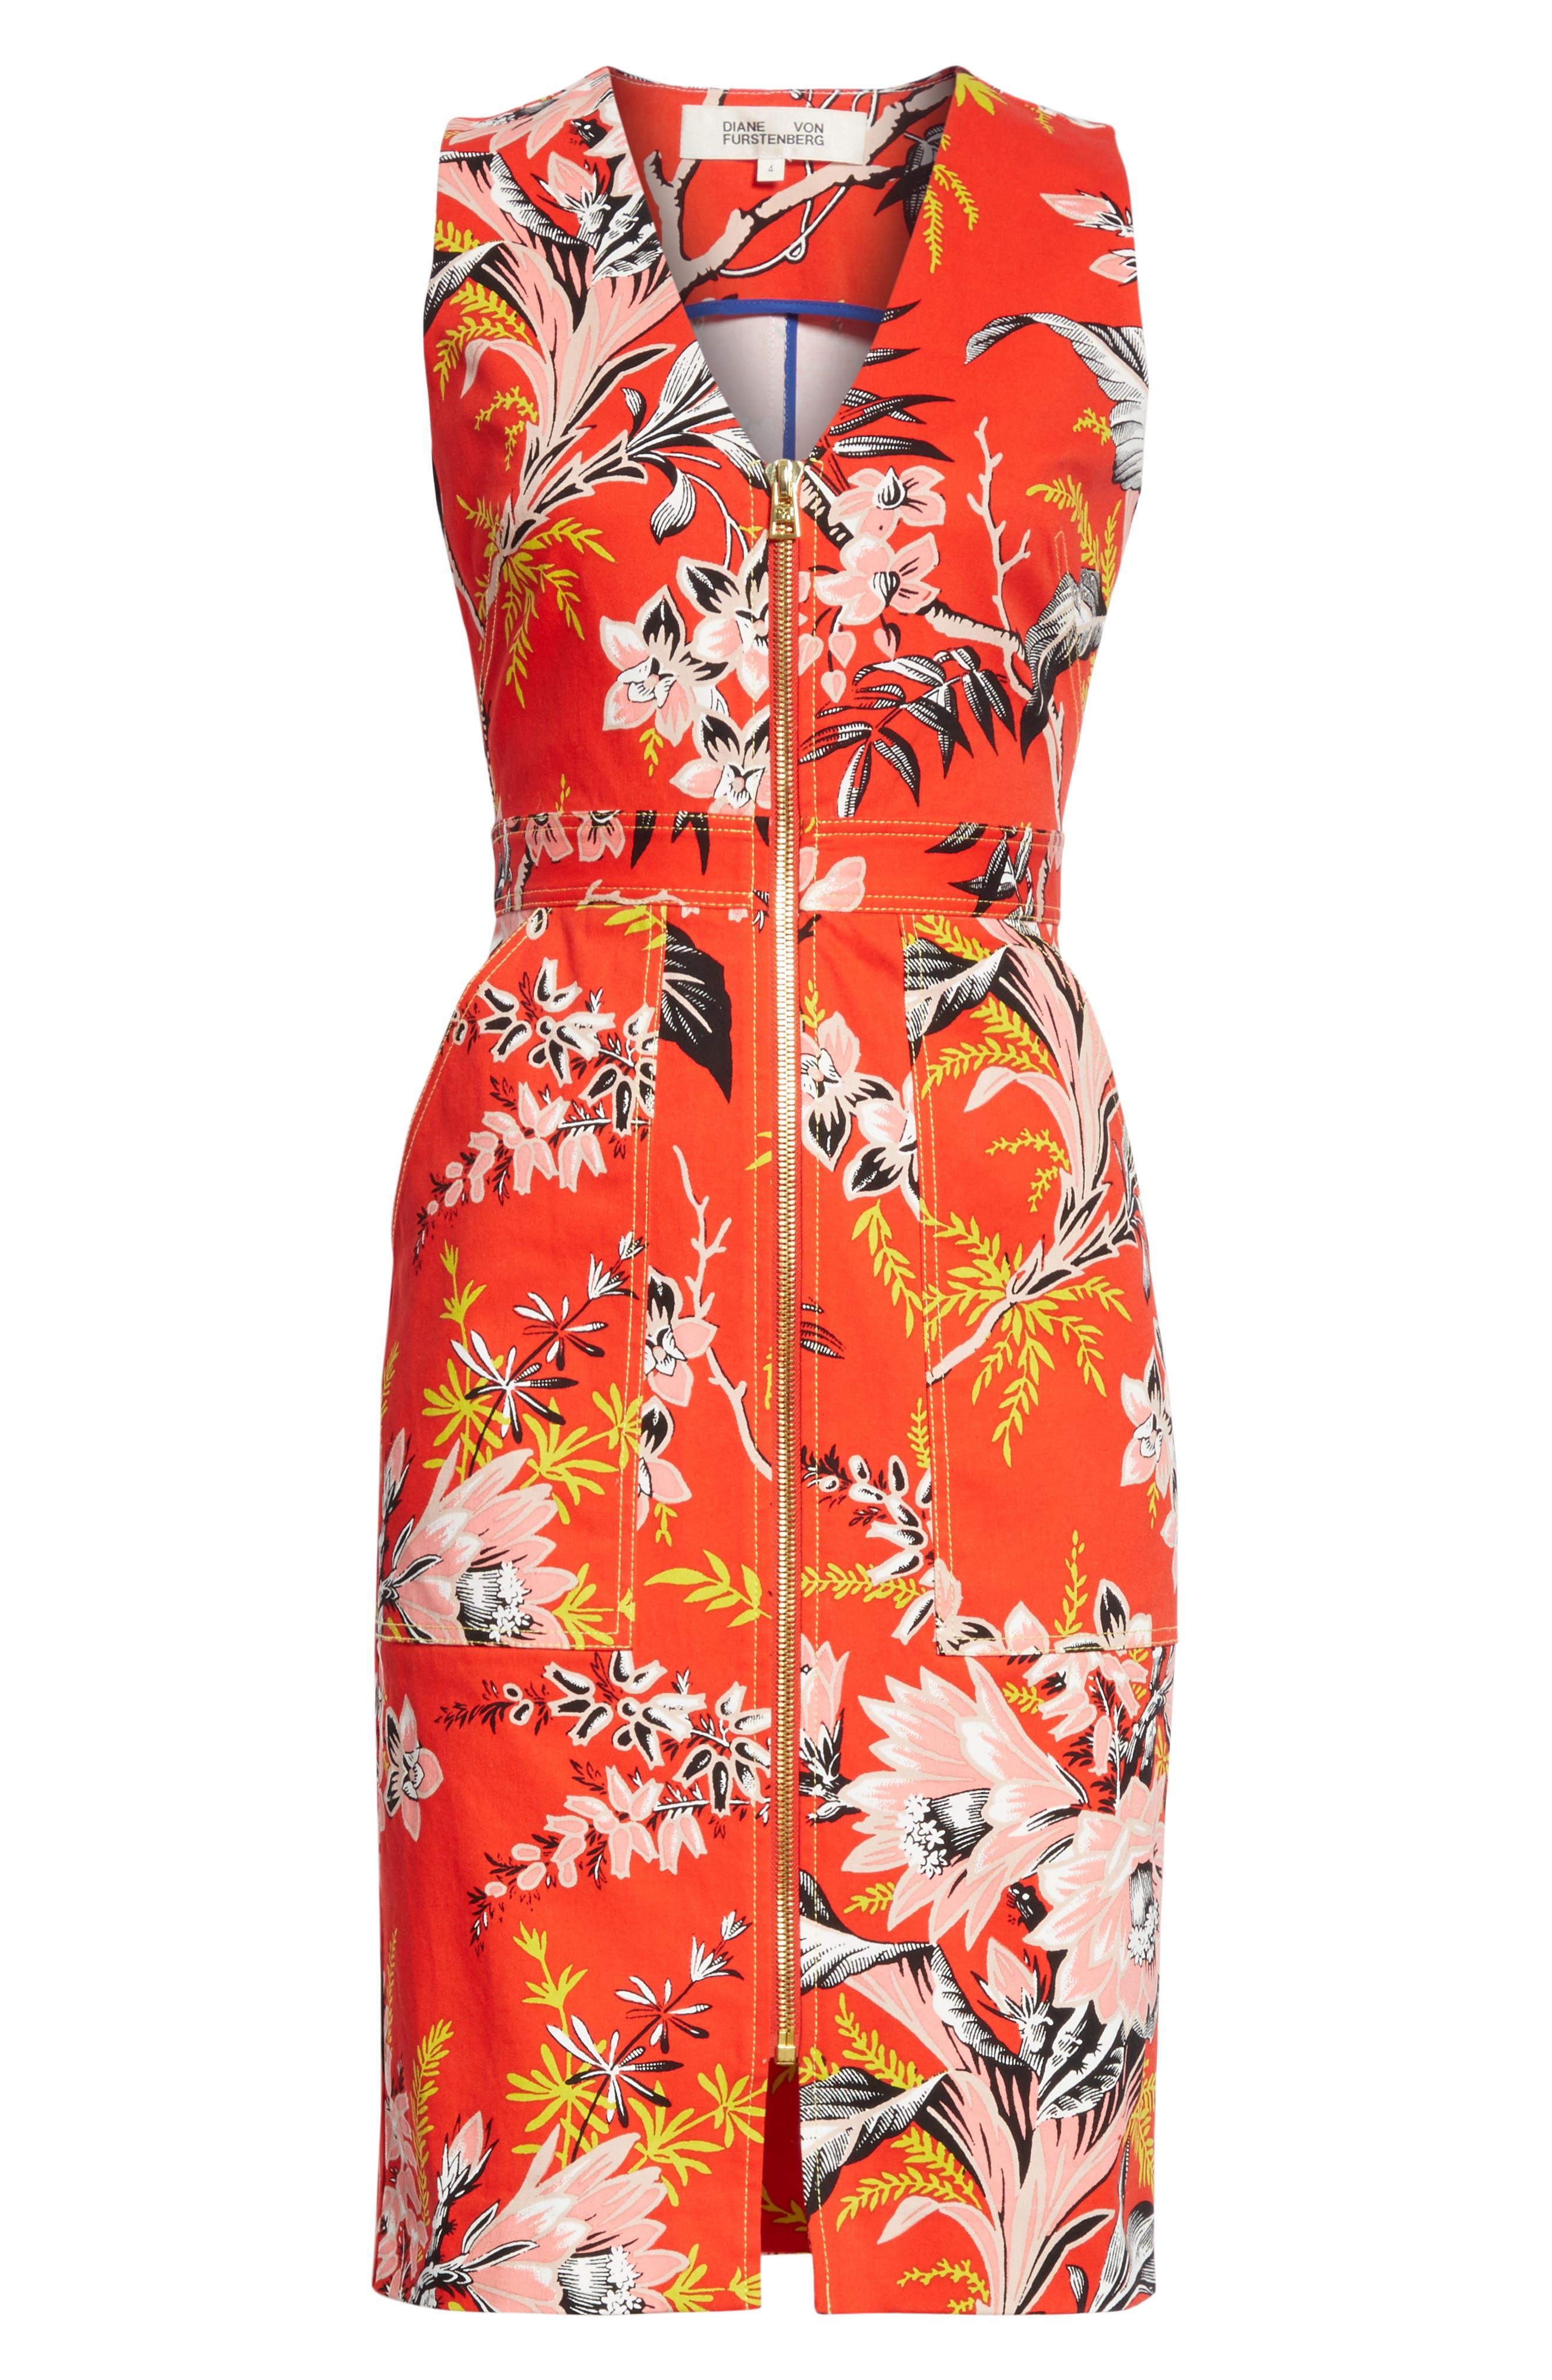 Diane von Furstenberg Floral Zip Front Stretch Cotton Sheath Dress,                             Alternate thumbnail 6, color,                             Avalon Poppy